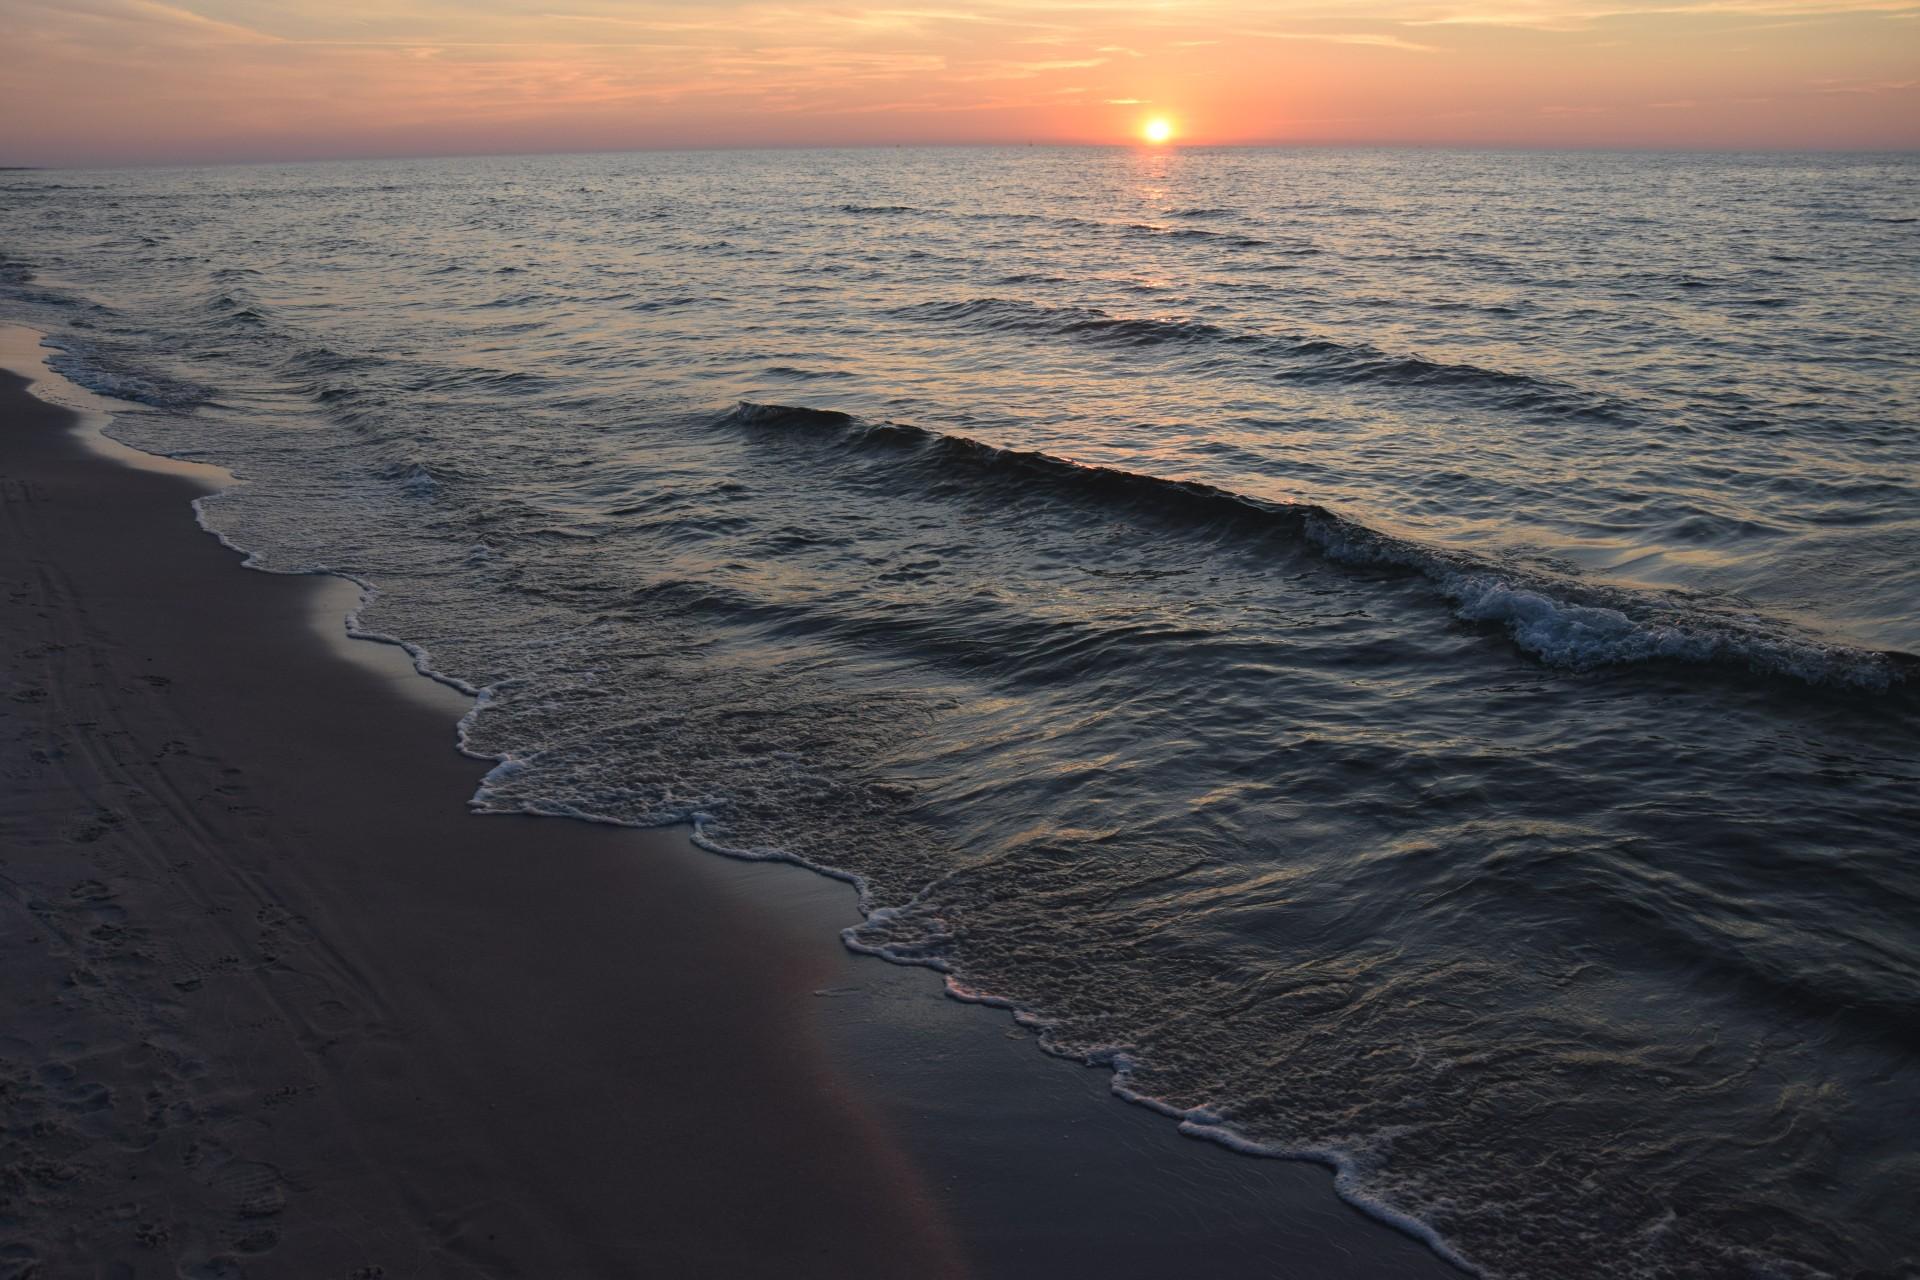 Kopalino, plaża Nieopowiedziane historie [FOTOREPORTAŻ] 13